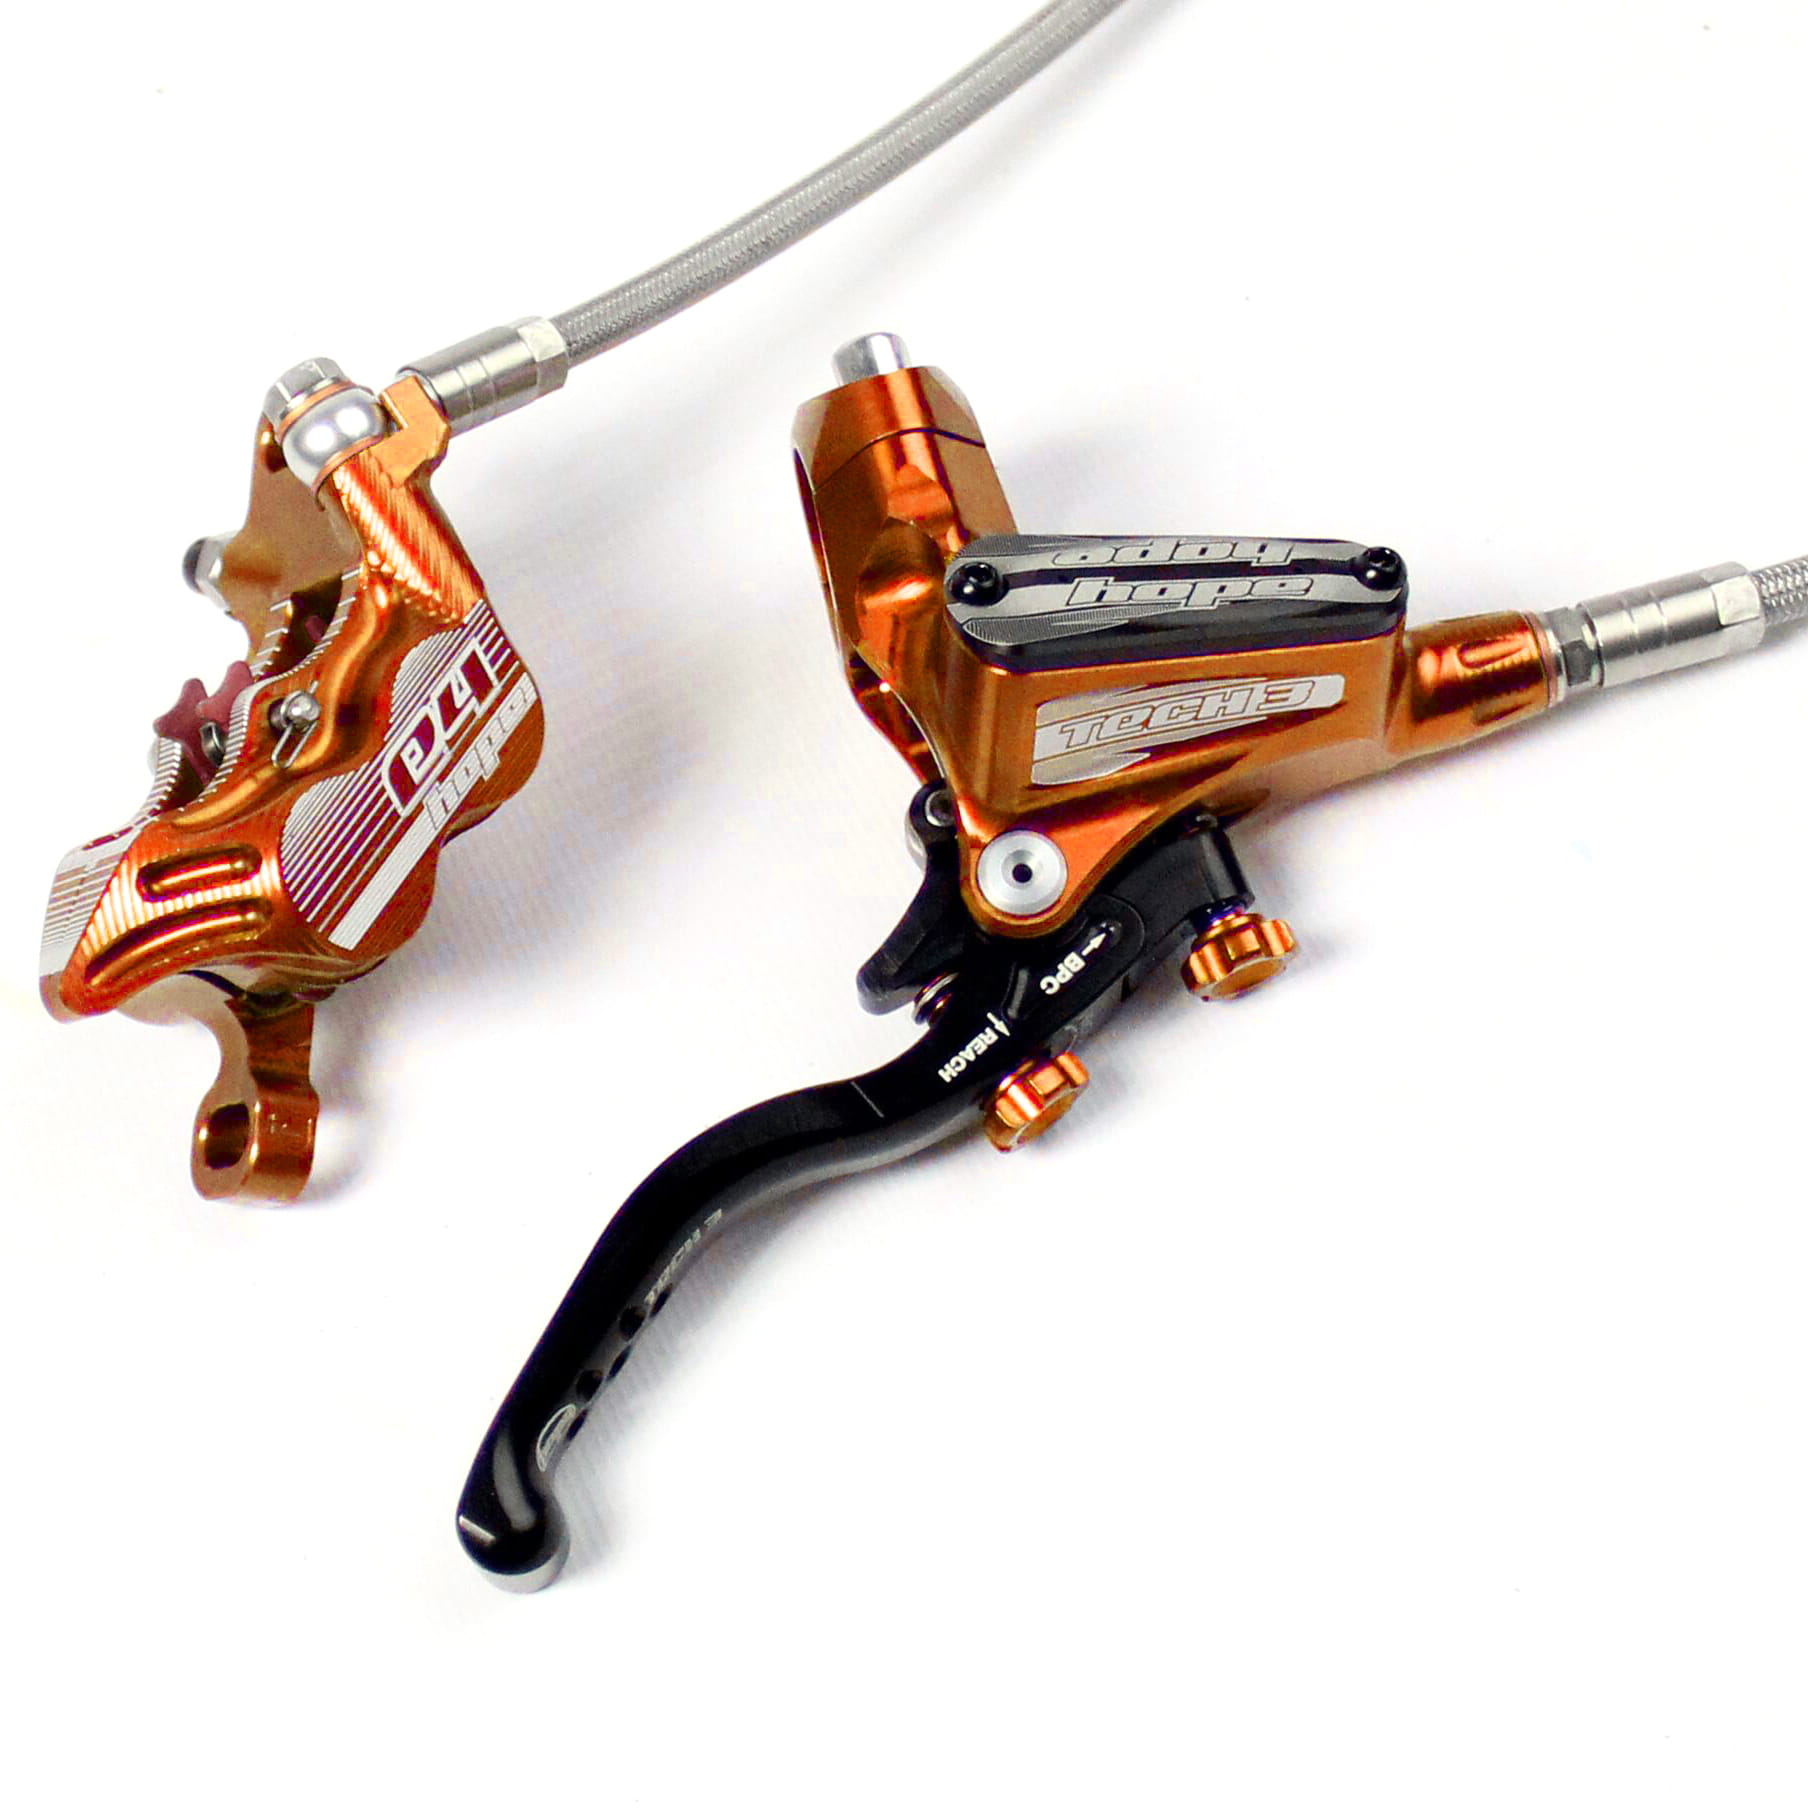 Brand New Hope Tech 3 V4 Orange Right Rear with Braided Hose Brake